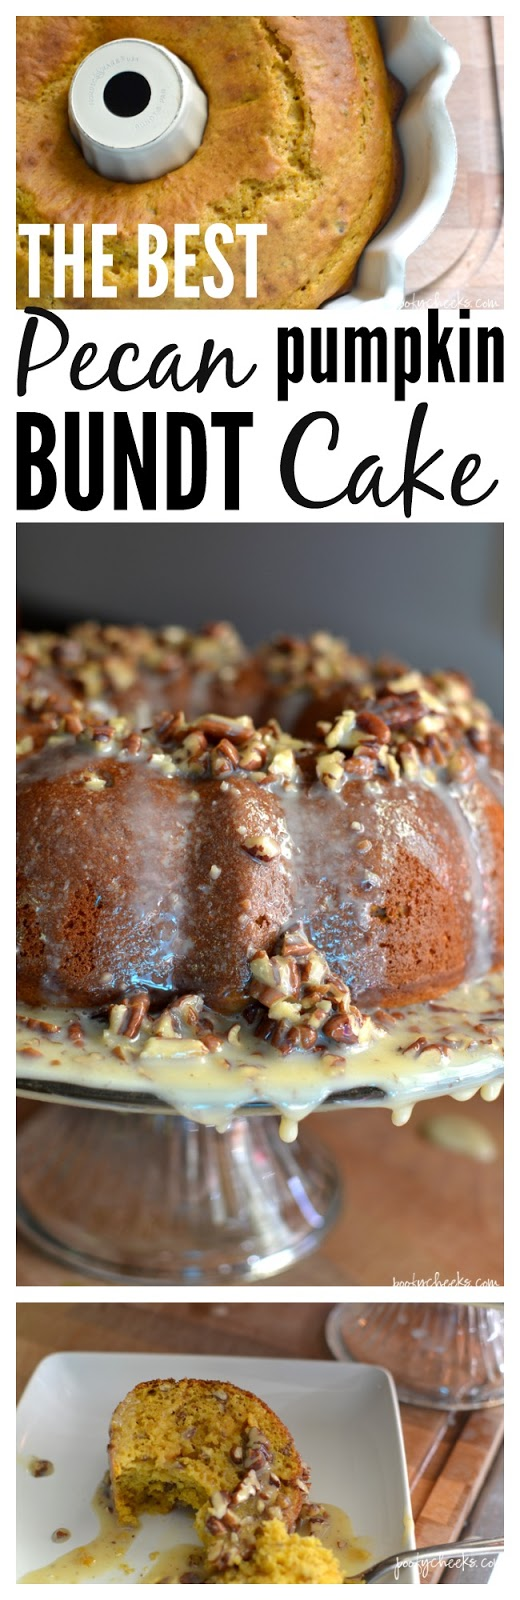 Pumpkin Bundt Cake Recipe - The best fall bundt cake.